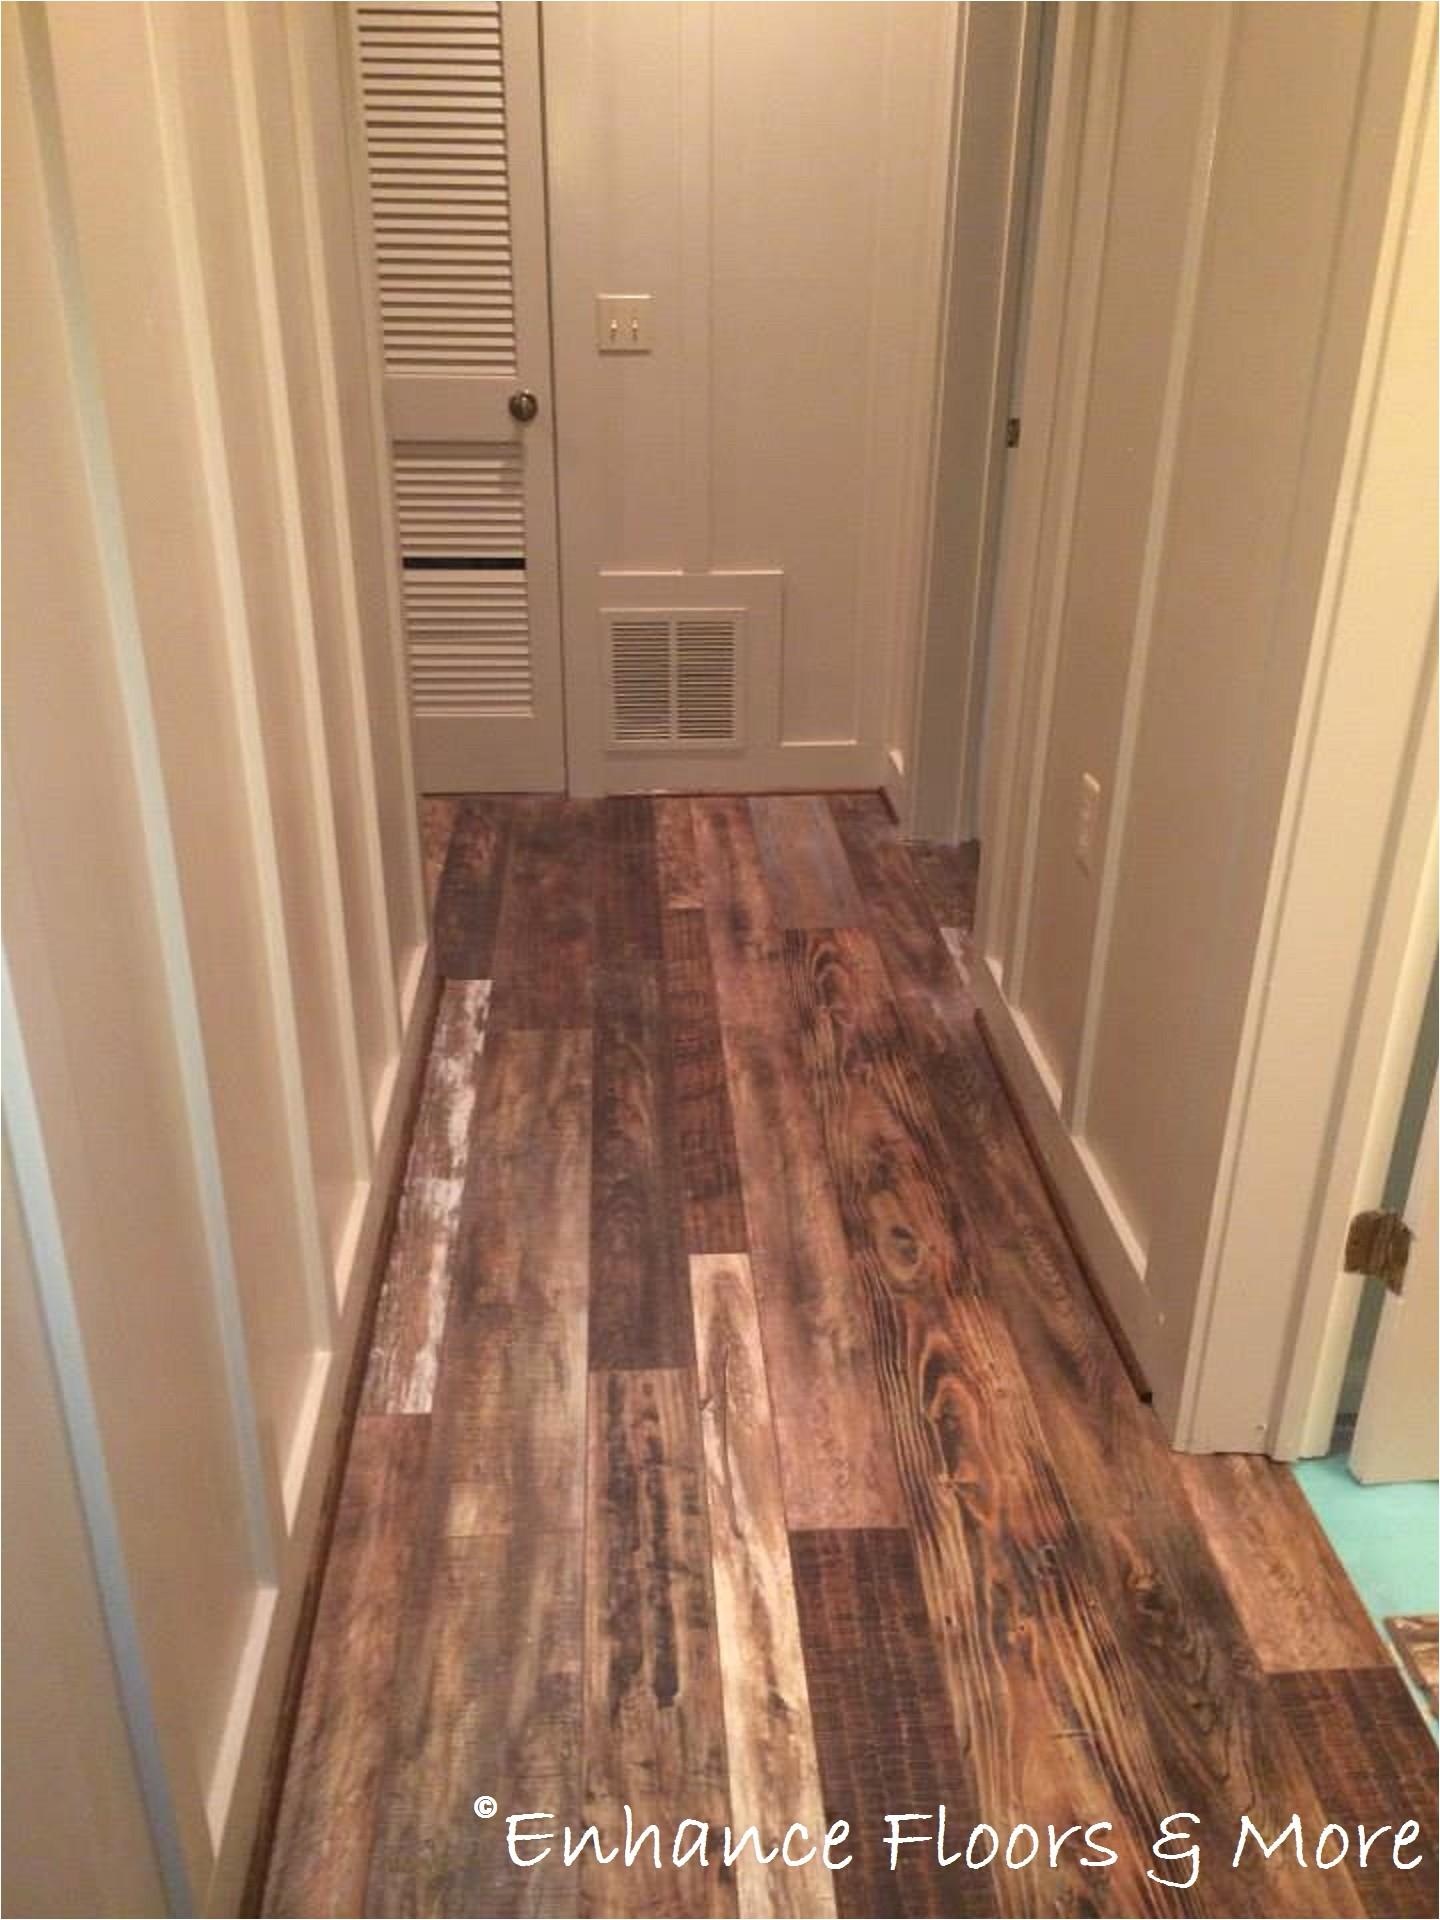 interesting jabara carpet outlet for awesome floor decoration ideas